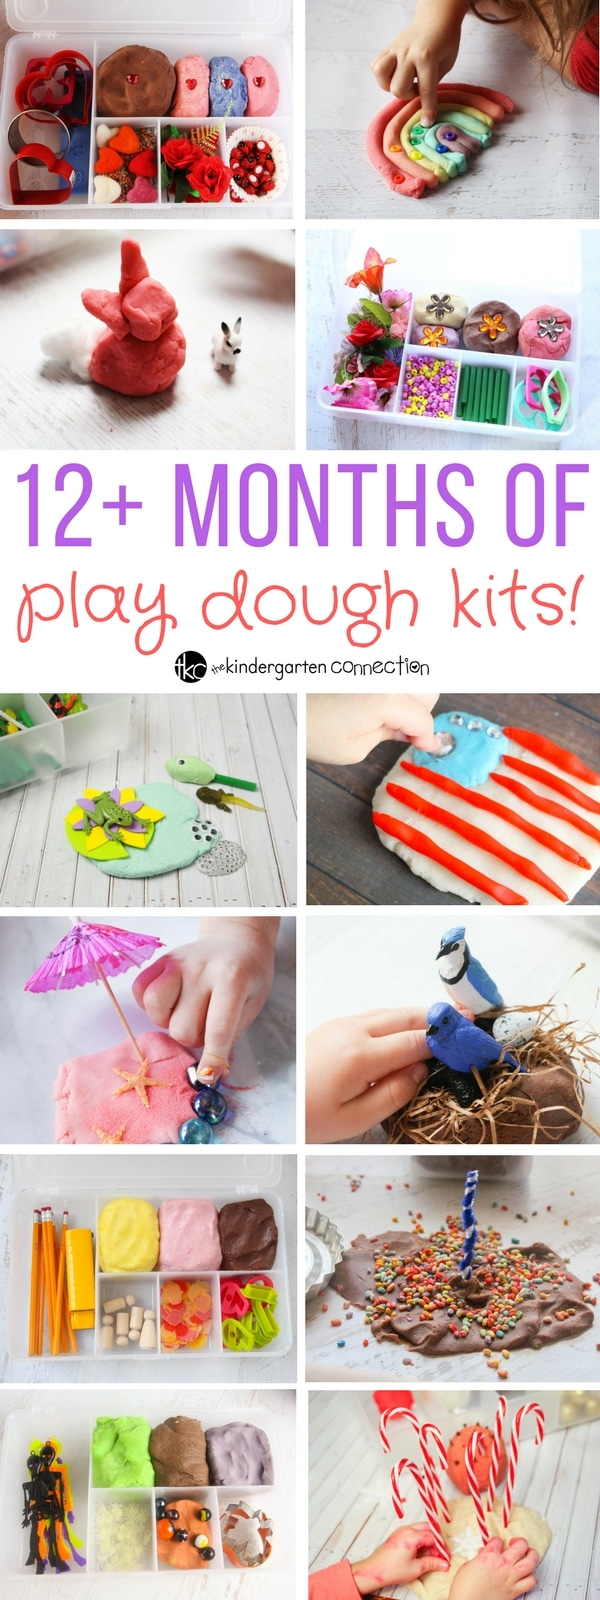 12 Months of Classroom Play Dough Activity Kits for preschool and kindergarten!